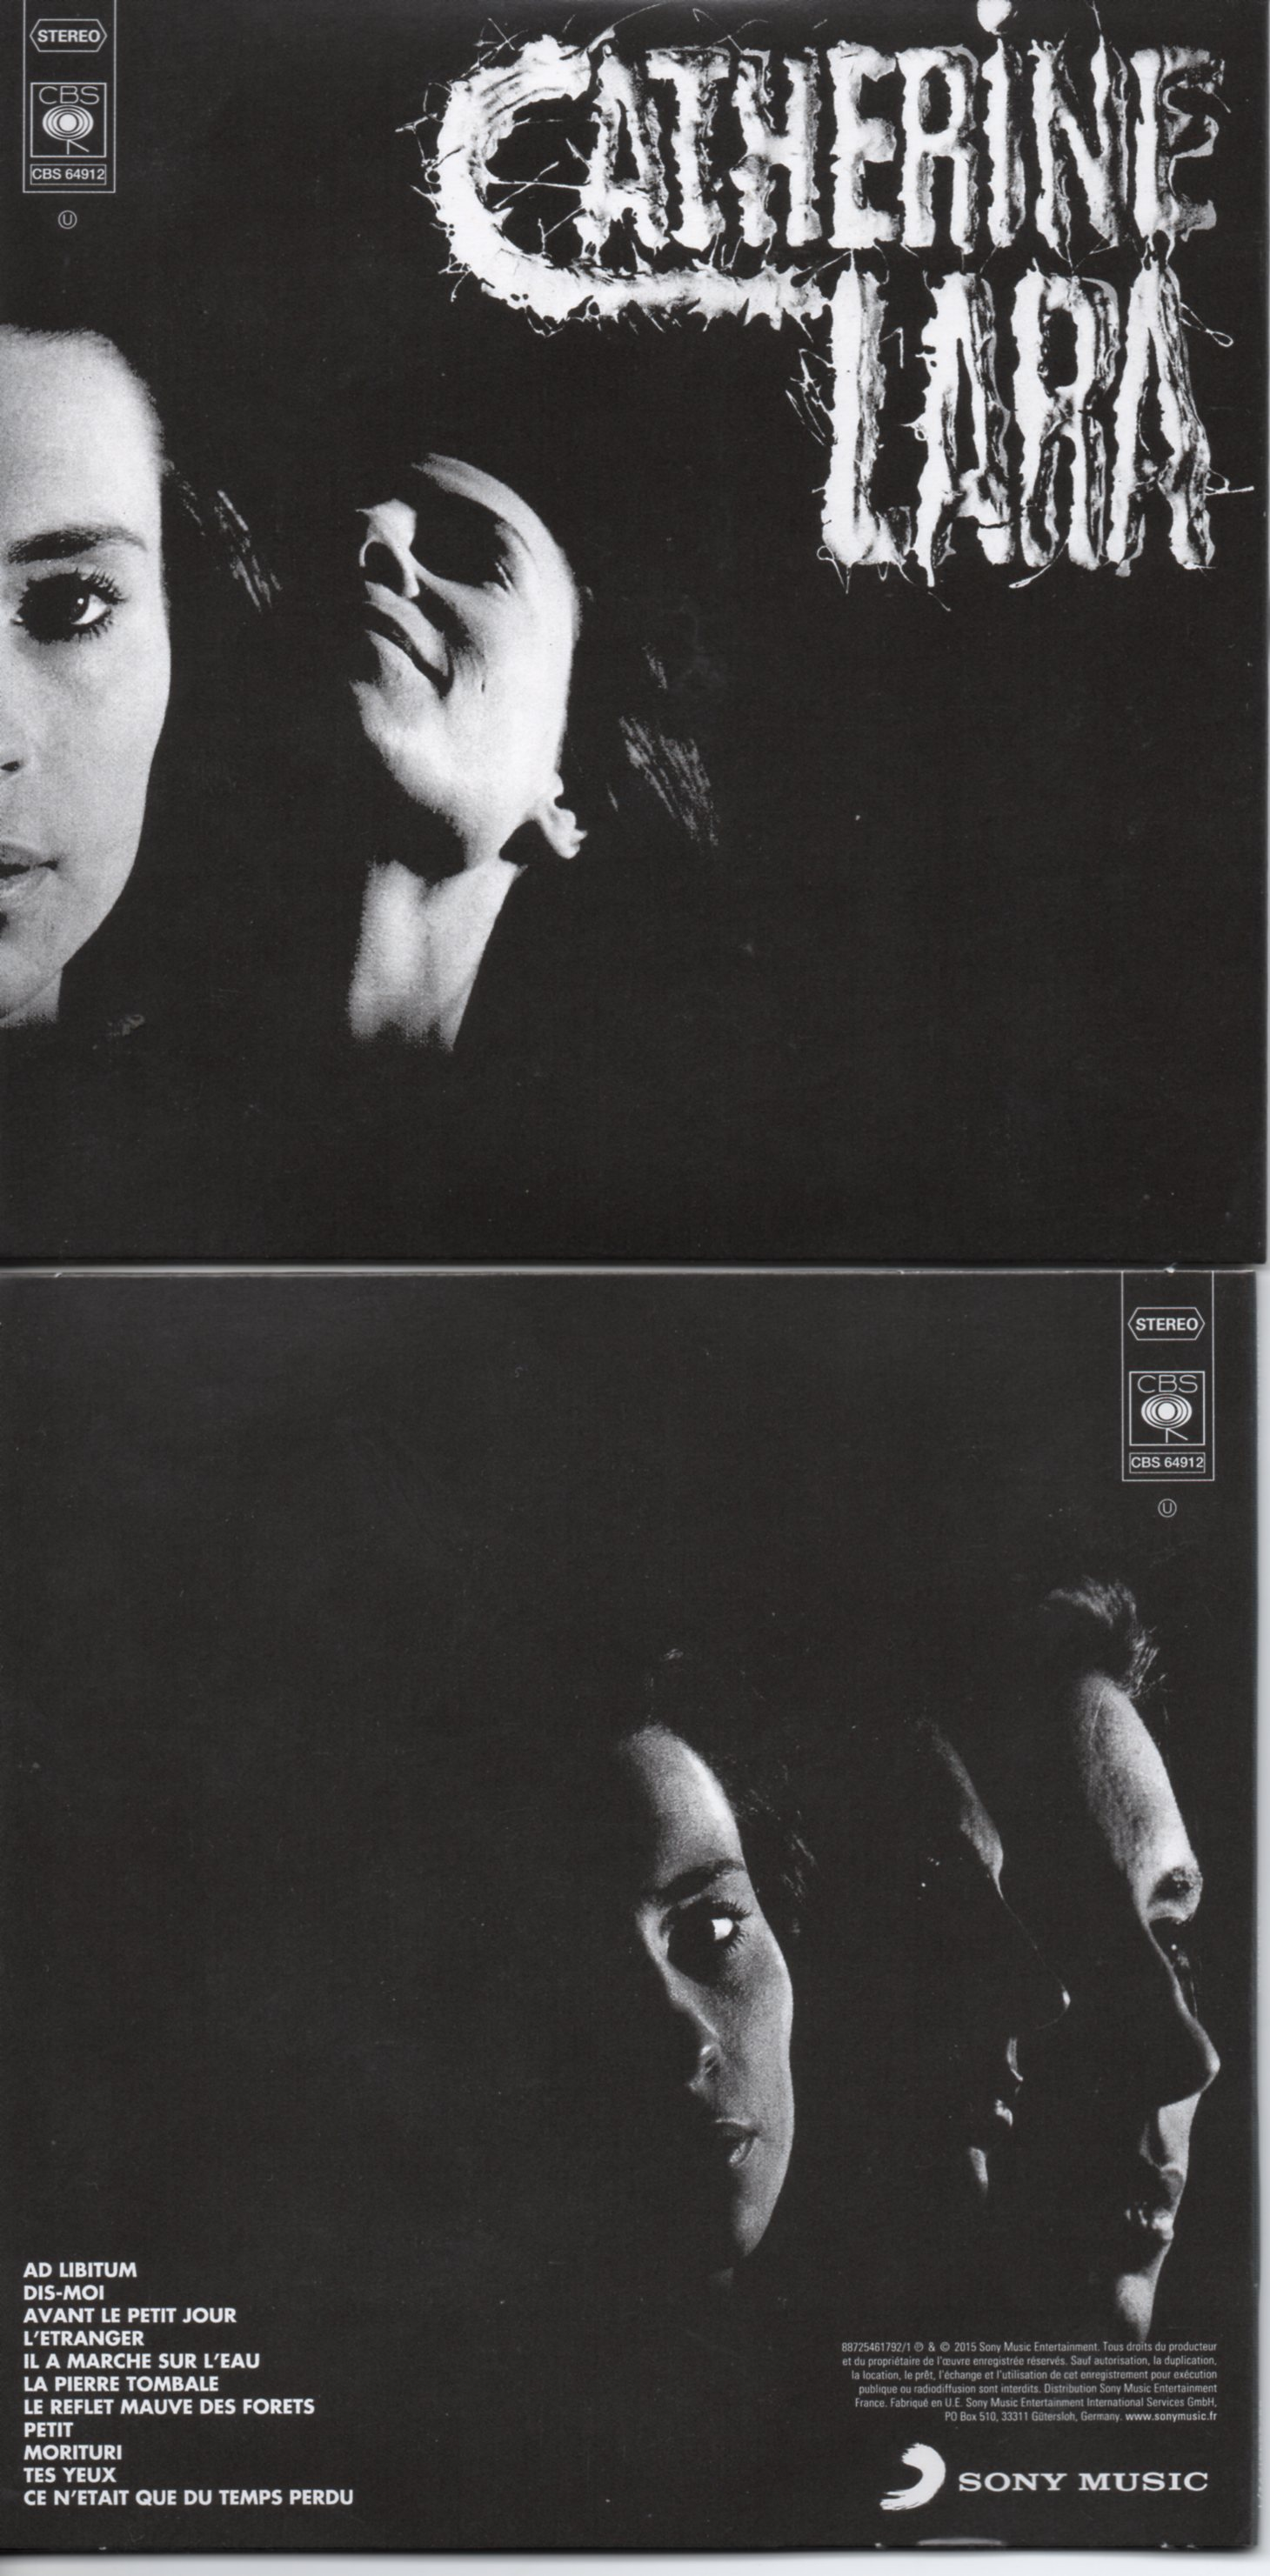 CATHERINE LARA - Ad Libitum - MINI LP REPLICA - 11-TRACK CARD SLEEVE - Pochette Cartonnée - CD